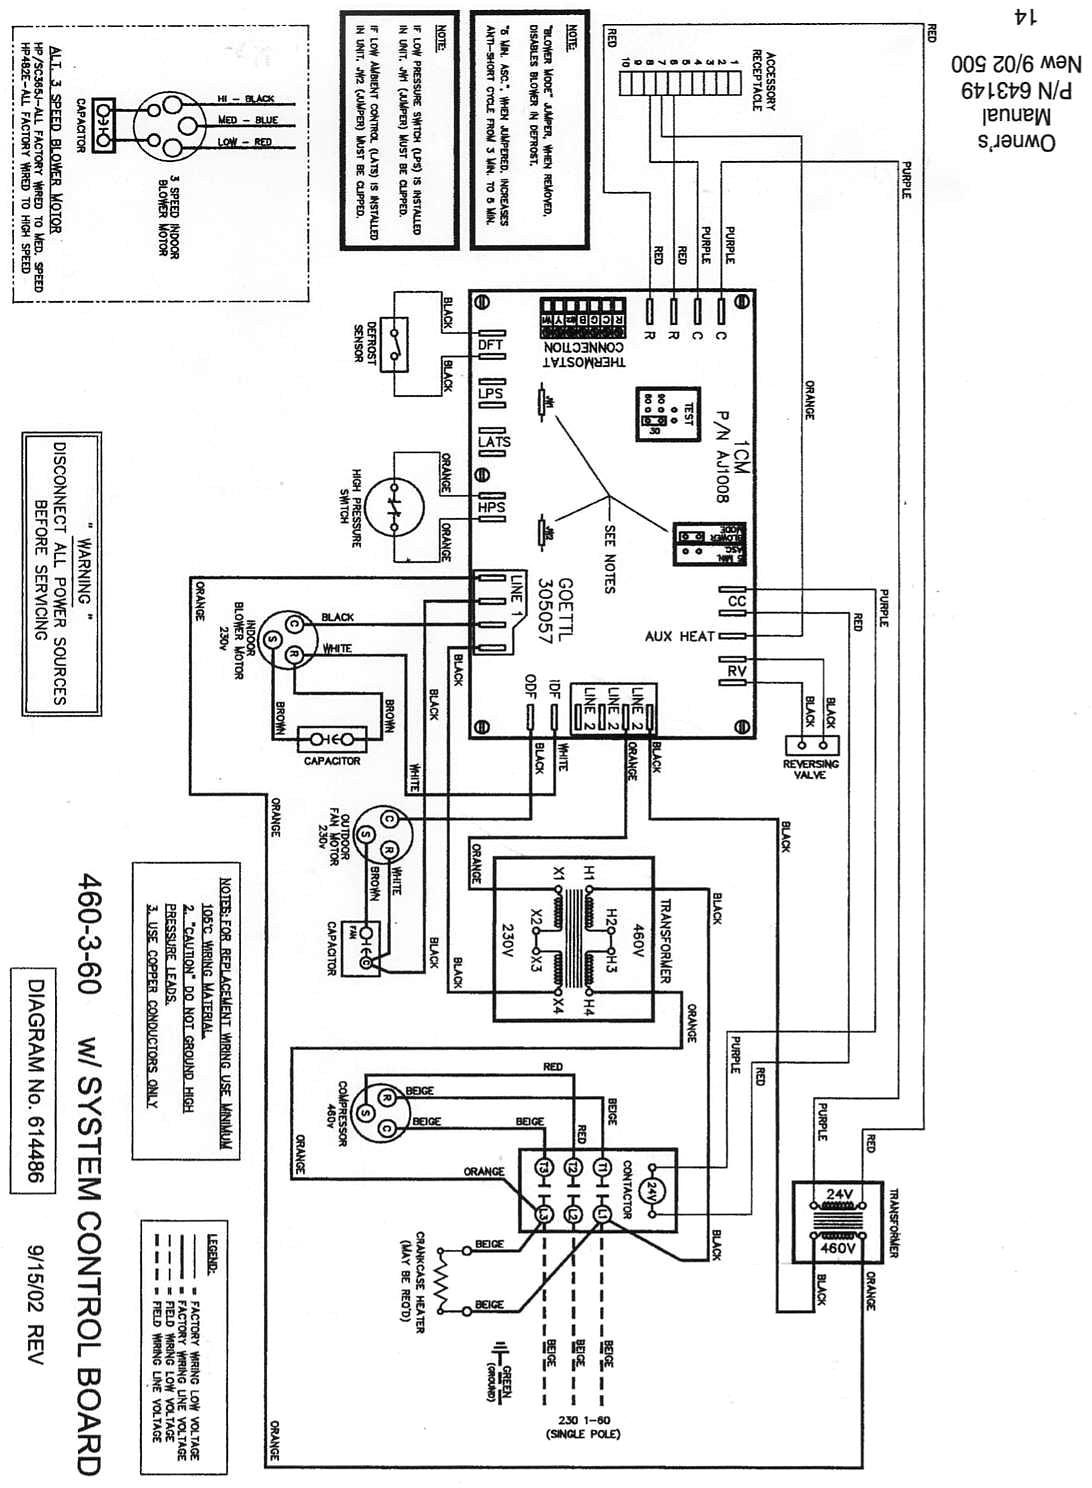 Wiring Diagram Trane Heat Pump Electrical Goodman Entrancing A